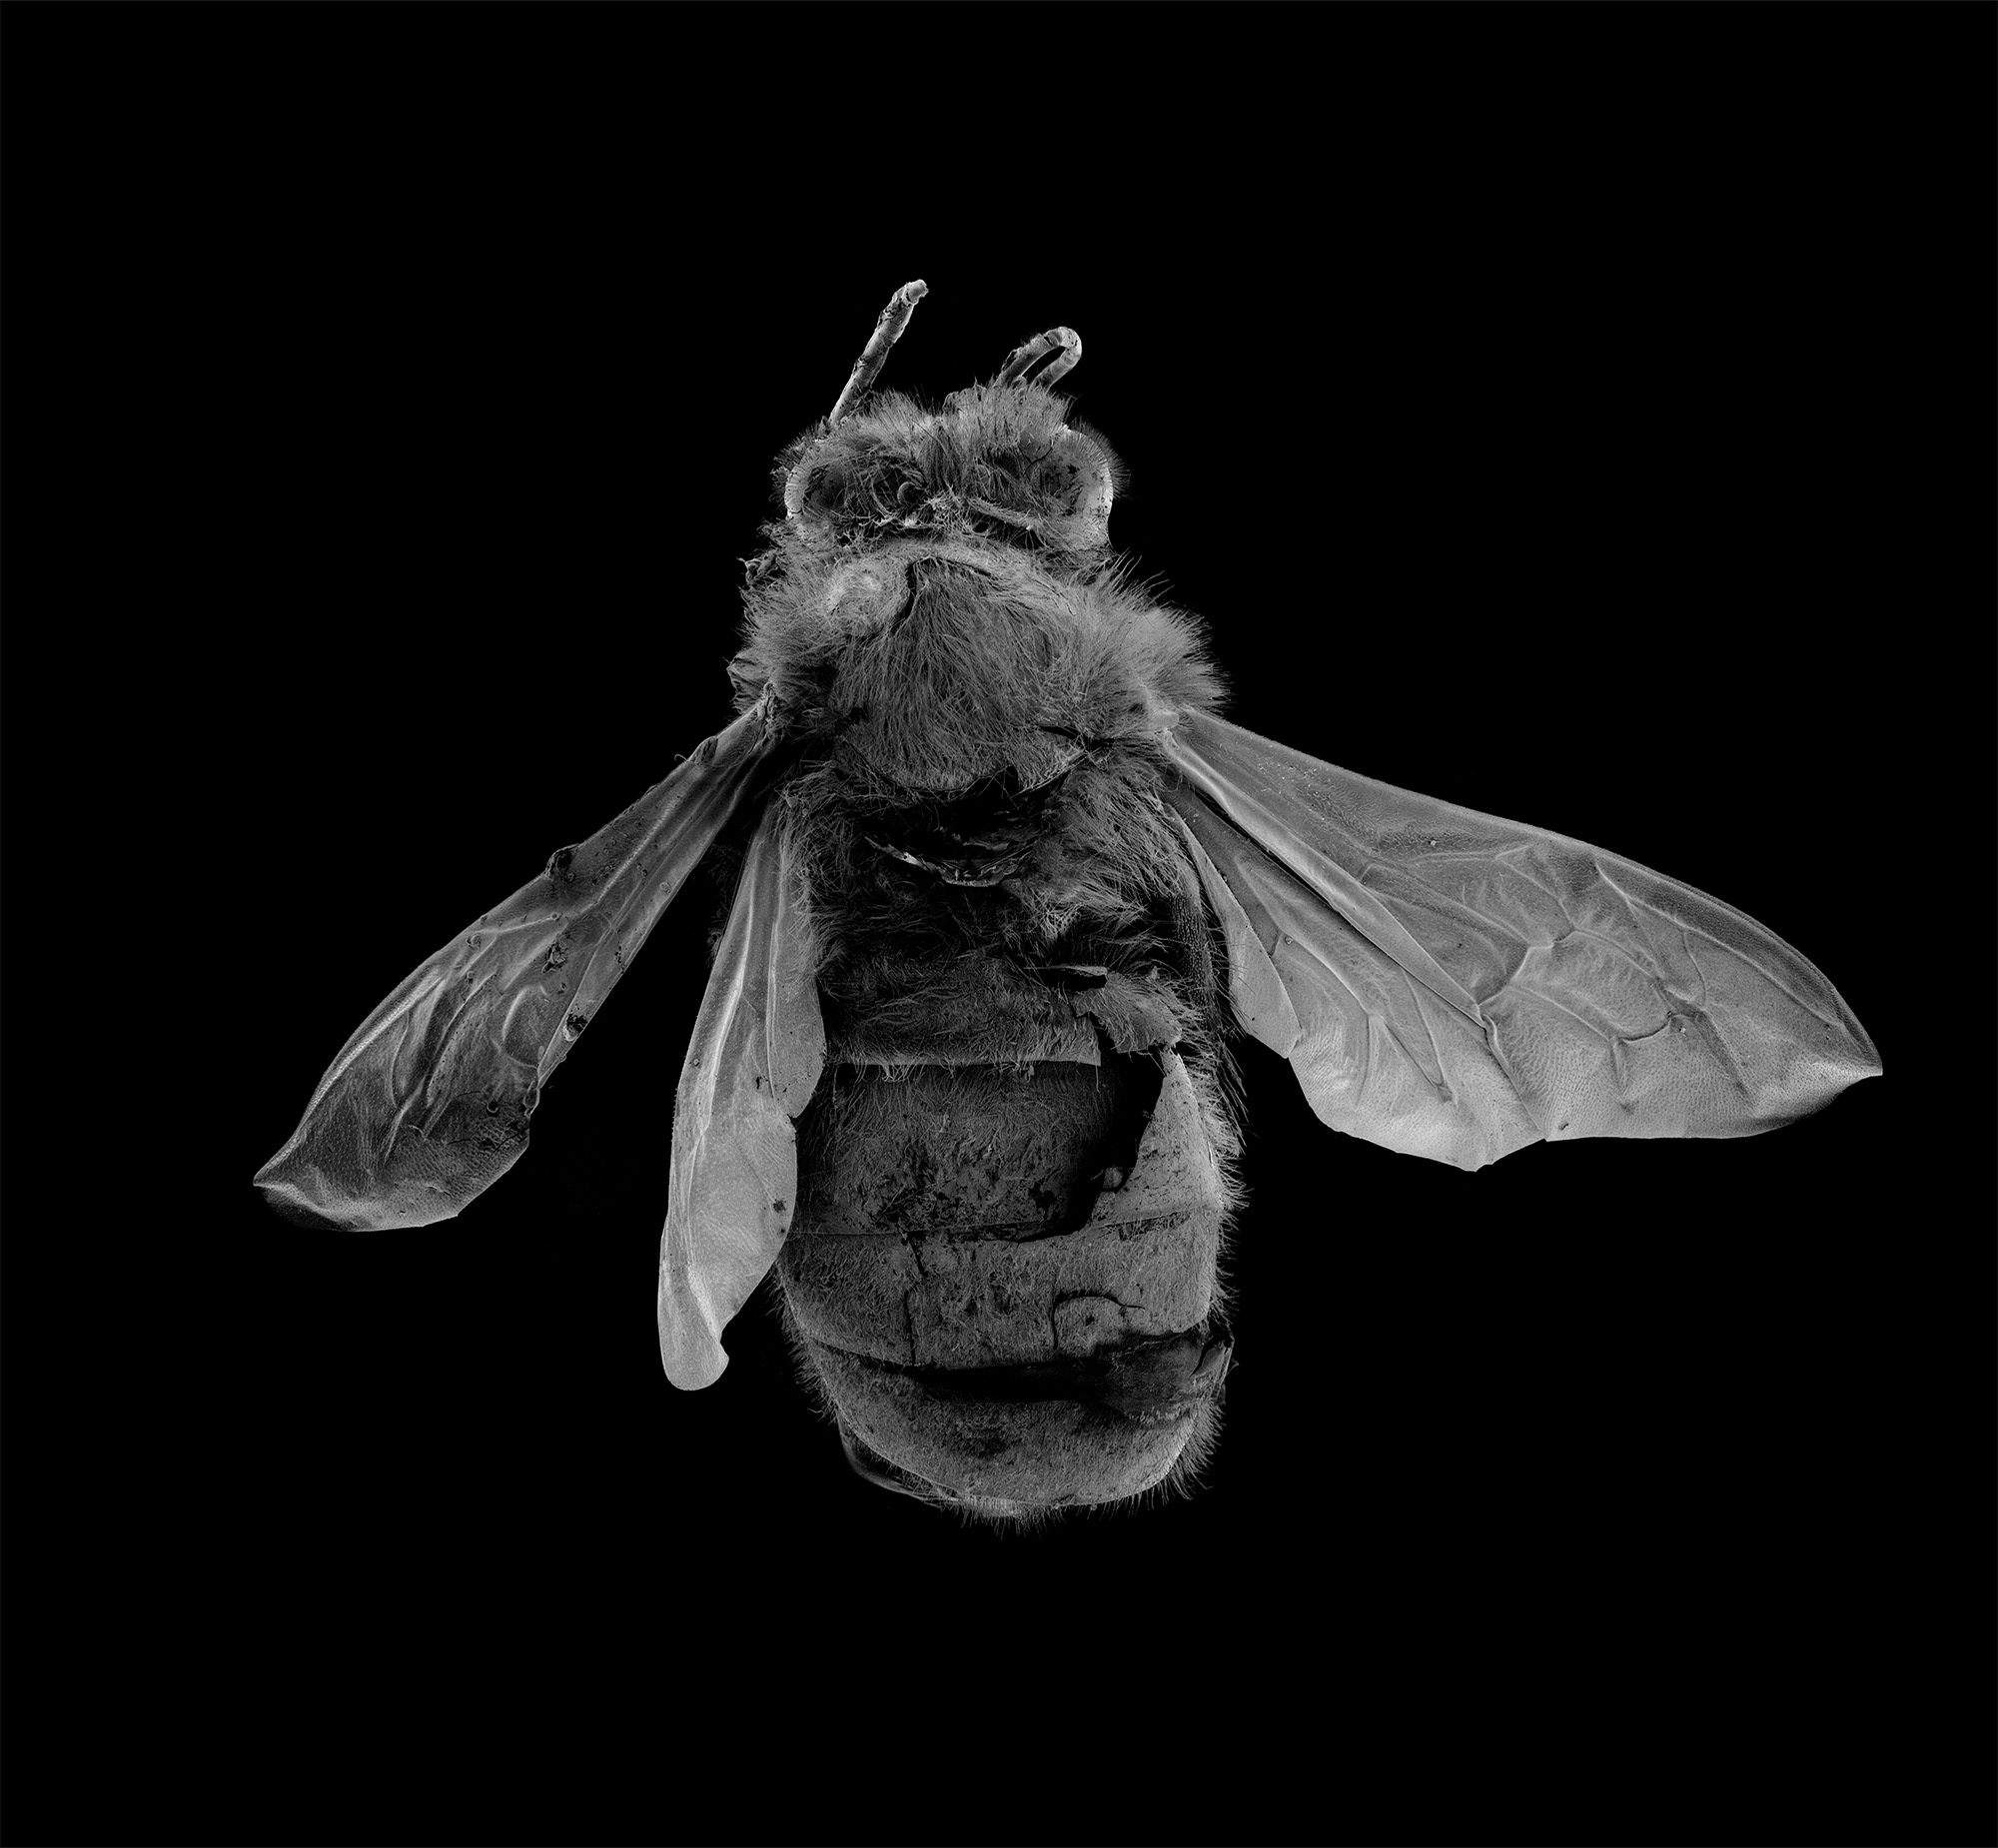 Elise_Gellweiler_EuropeanHoneyBee_2017_165cmx150cm_Microscopy.jpg